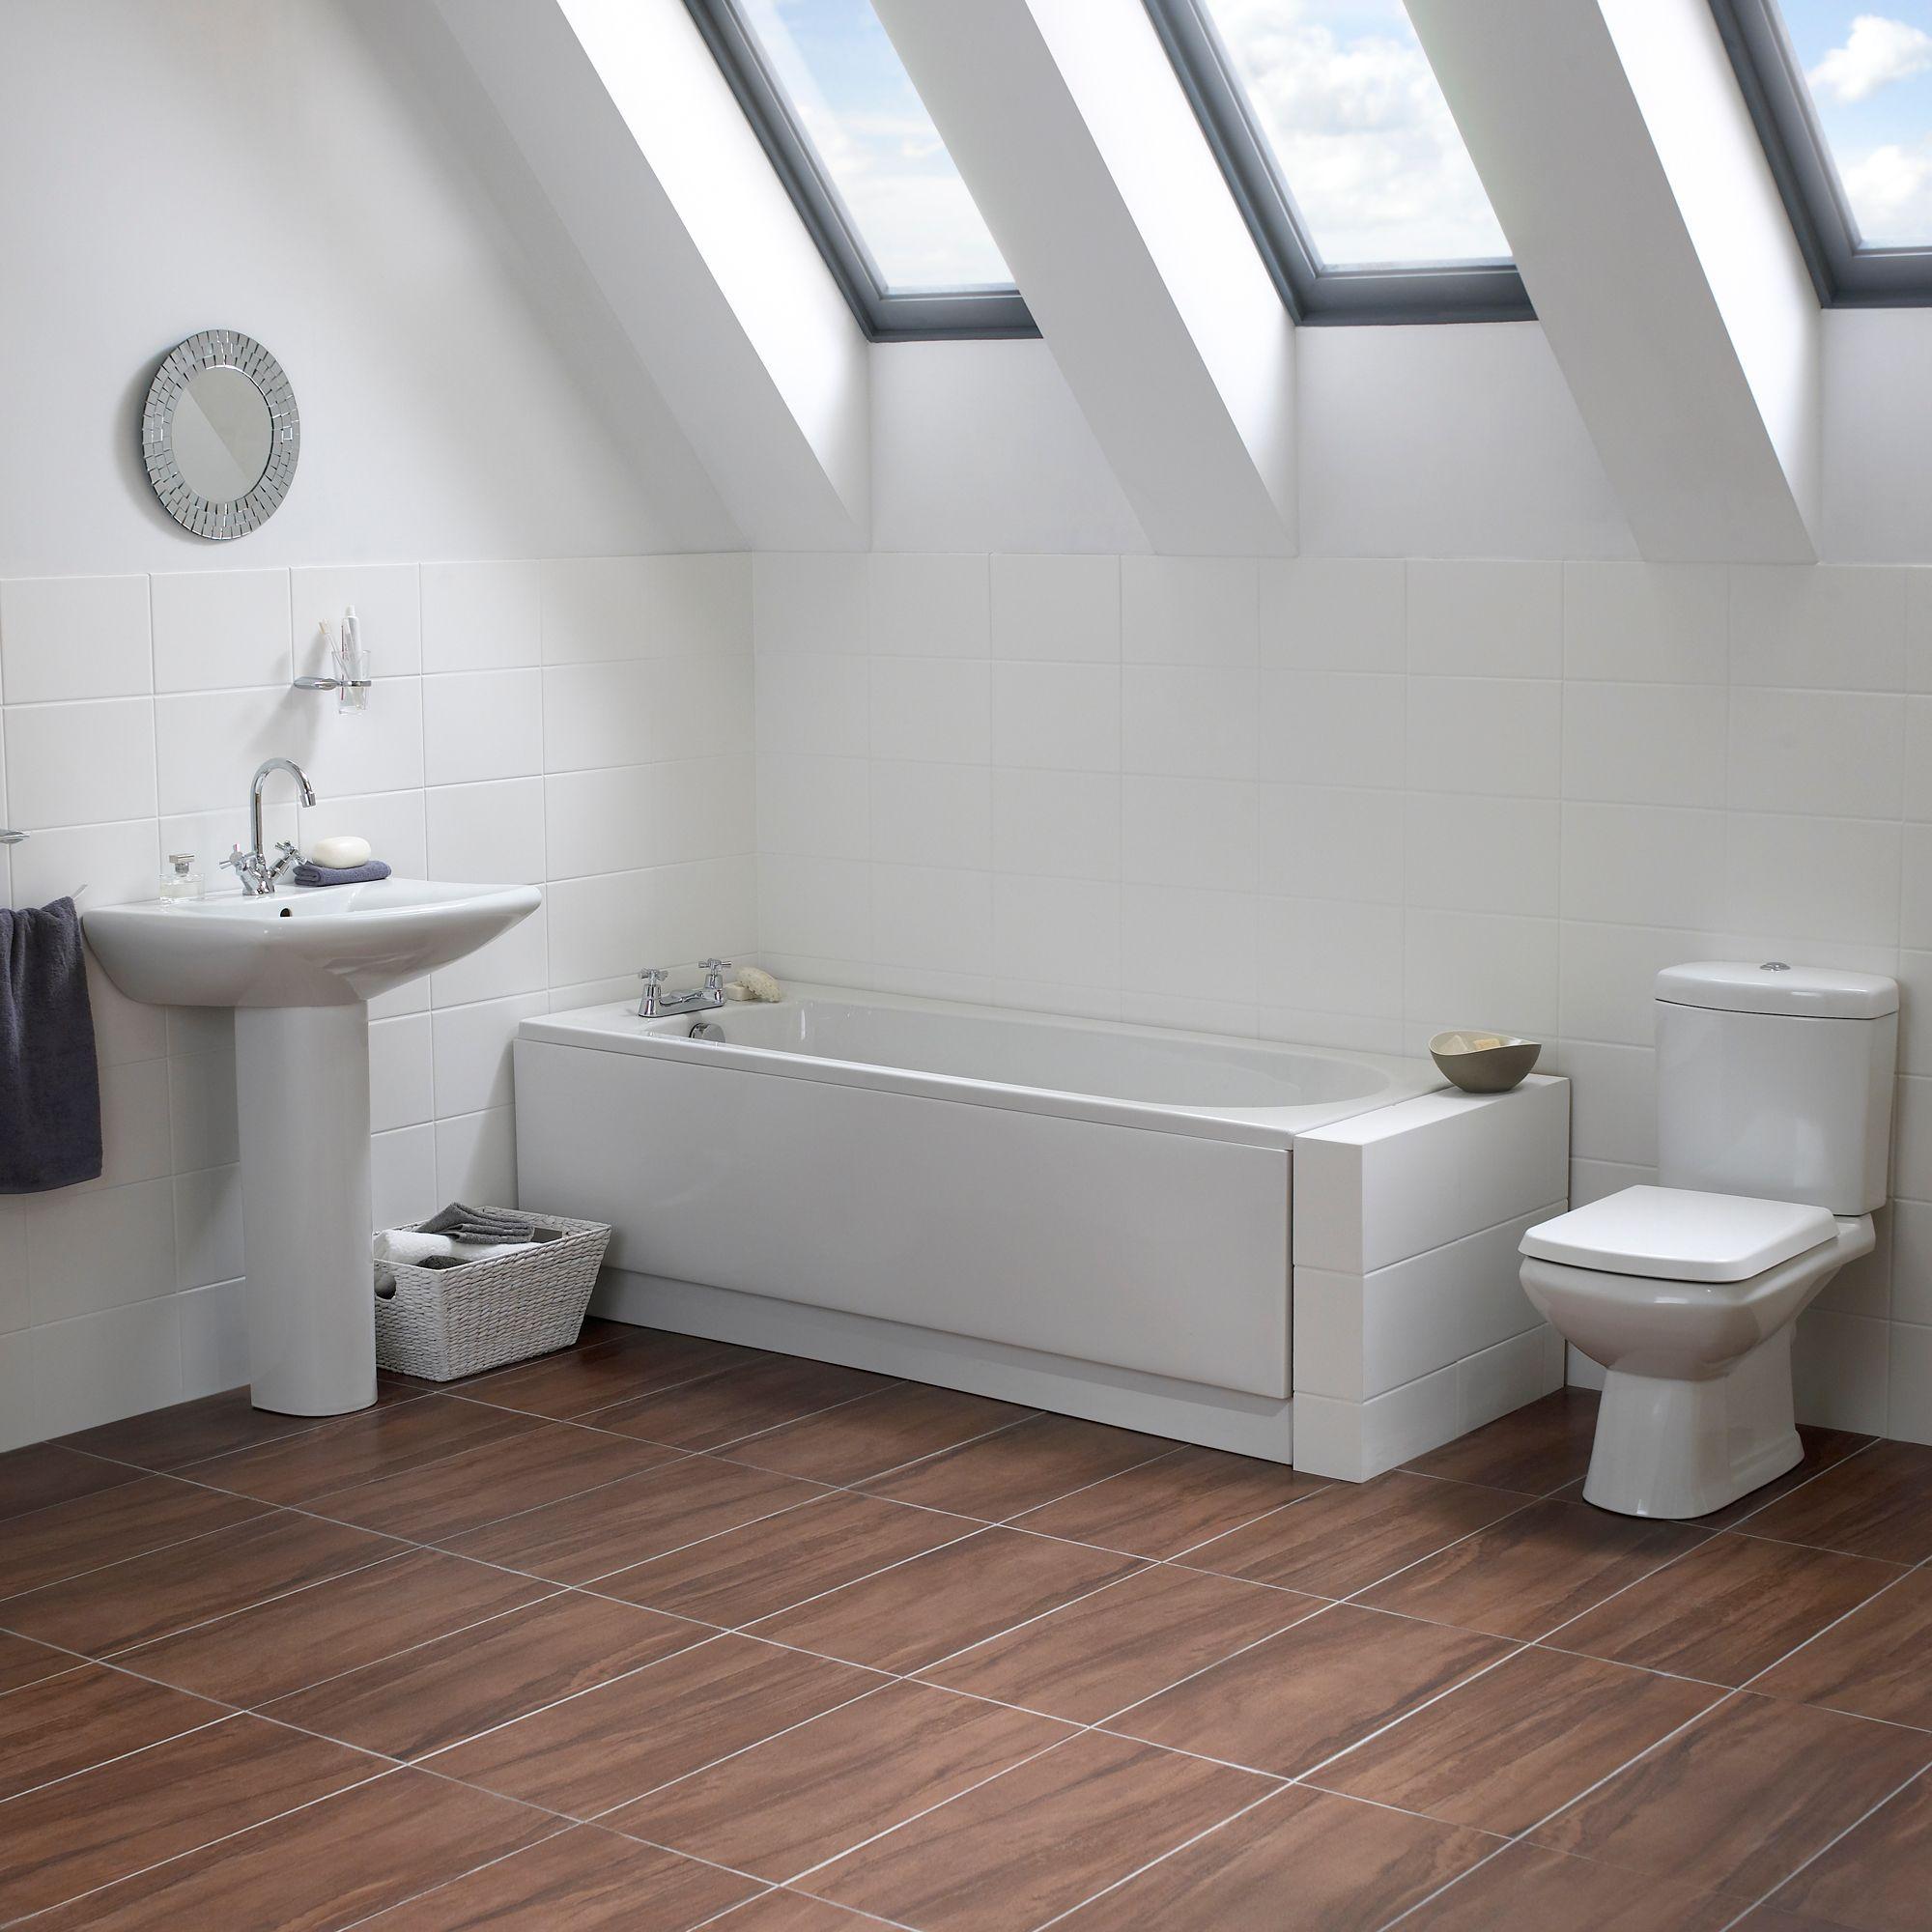 b and q bathrooms suites cooke lewis seattle bath toilet basin tap pack departments diy - B And Q Bathroom Design